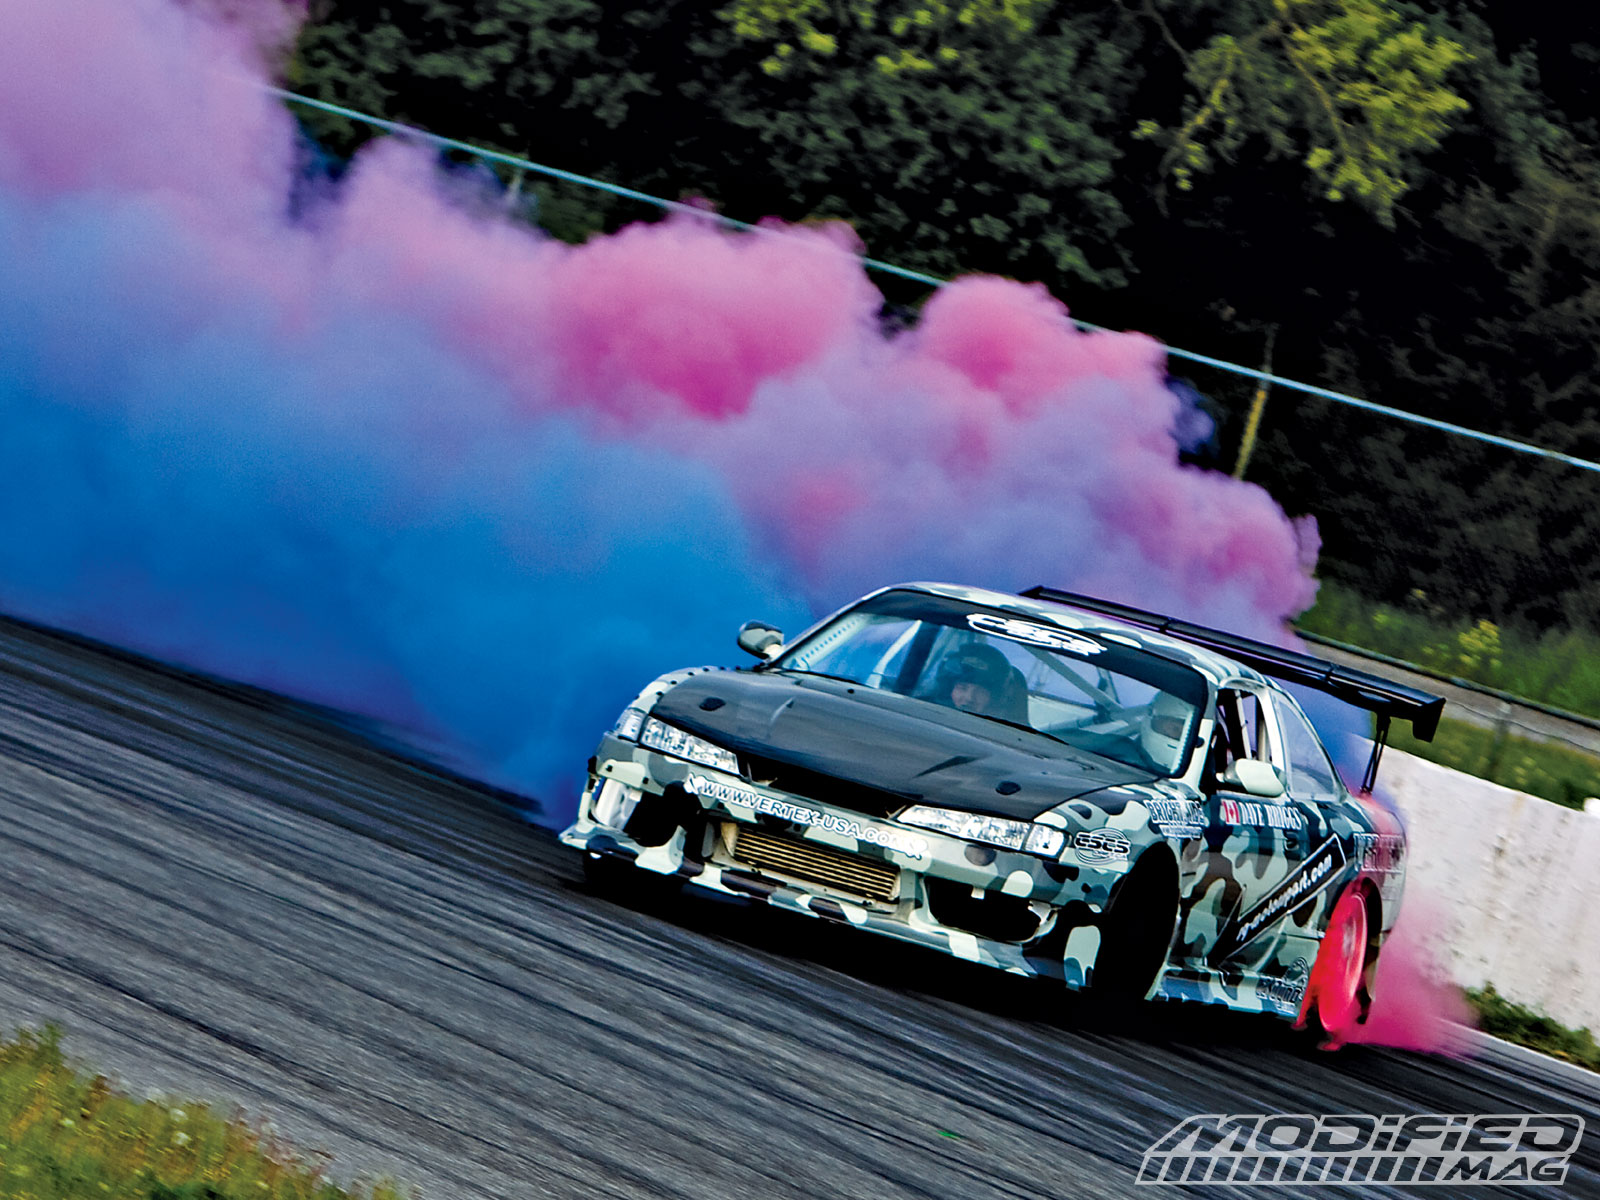 drifting car hd wallpaper car wallpapers